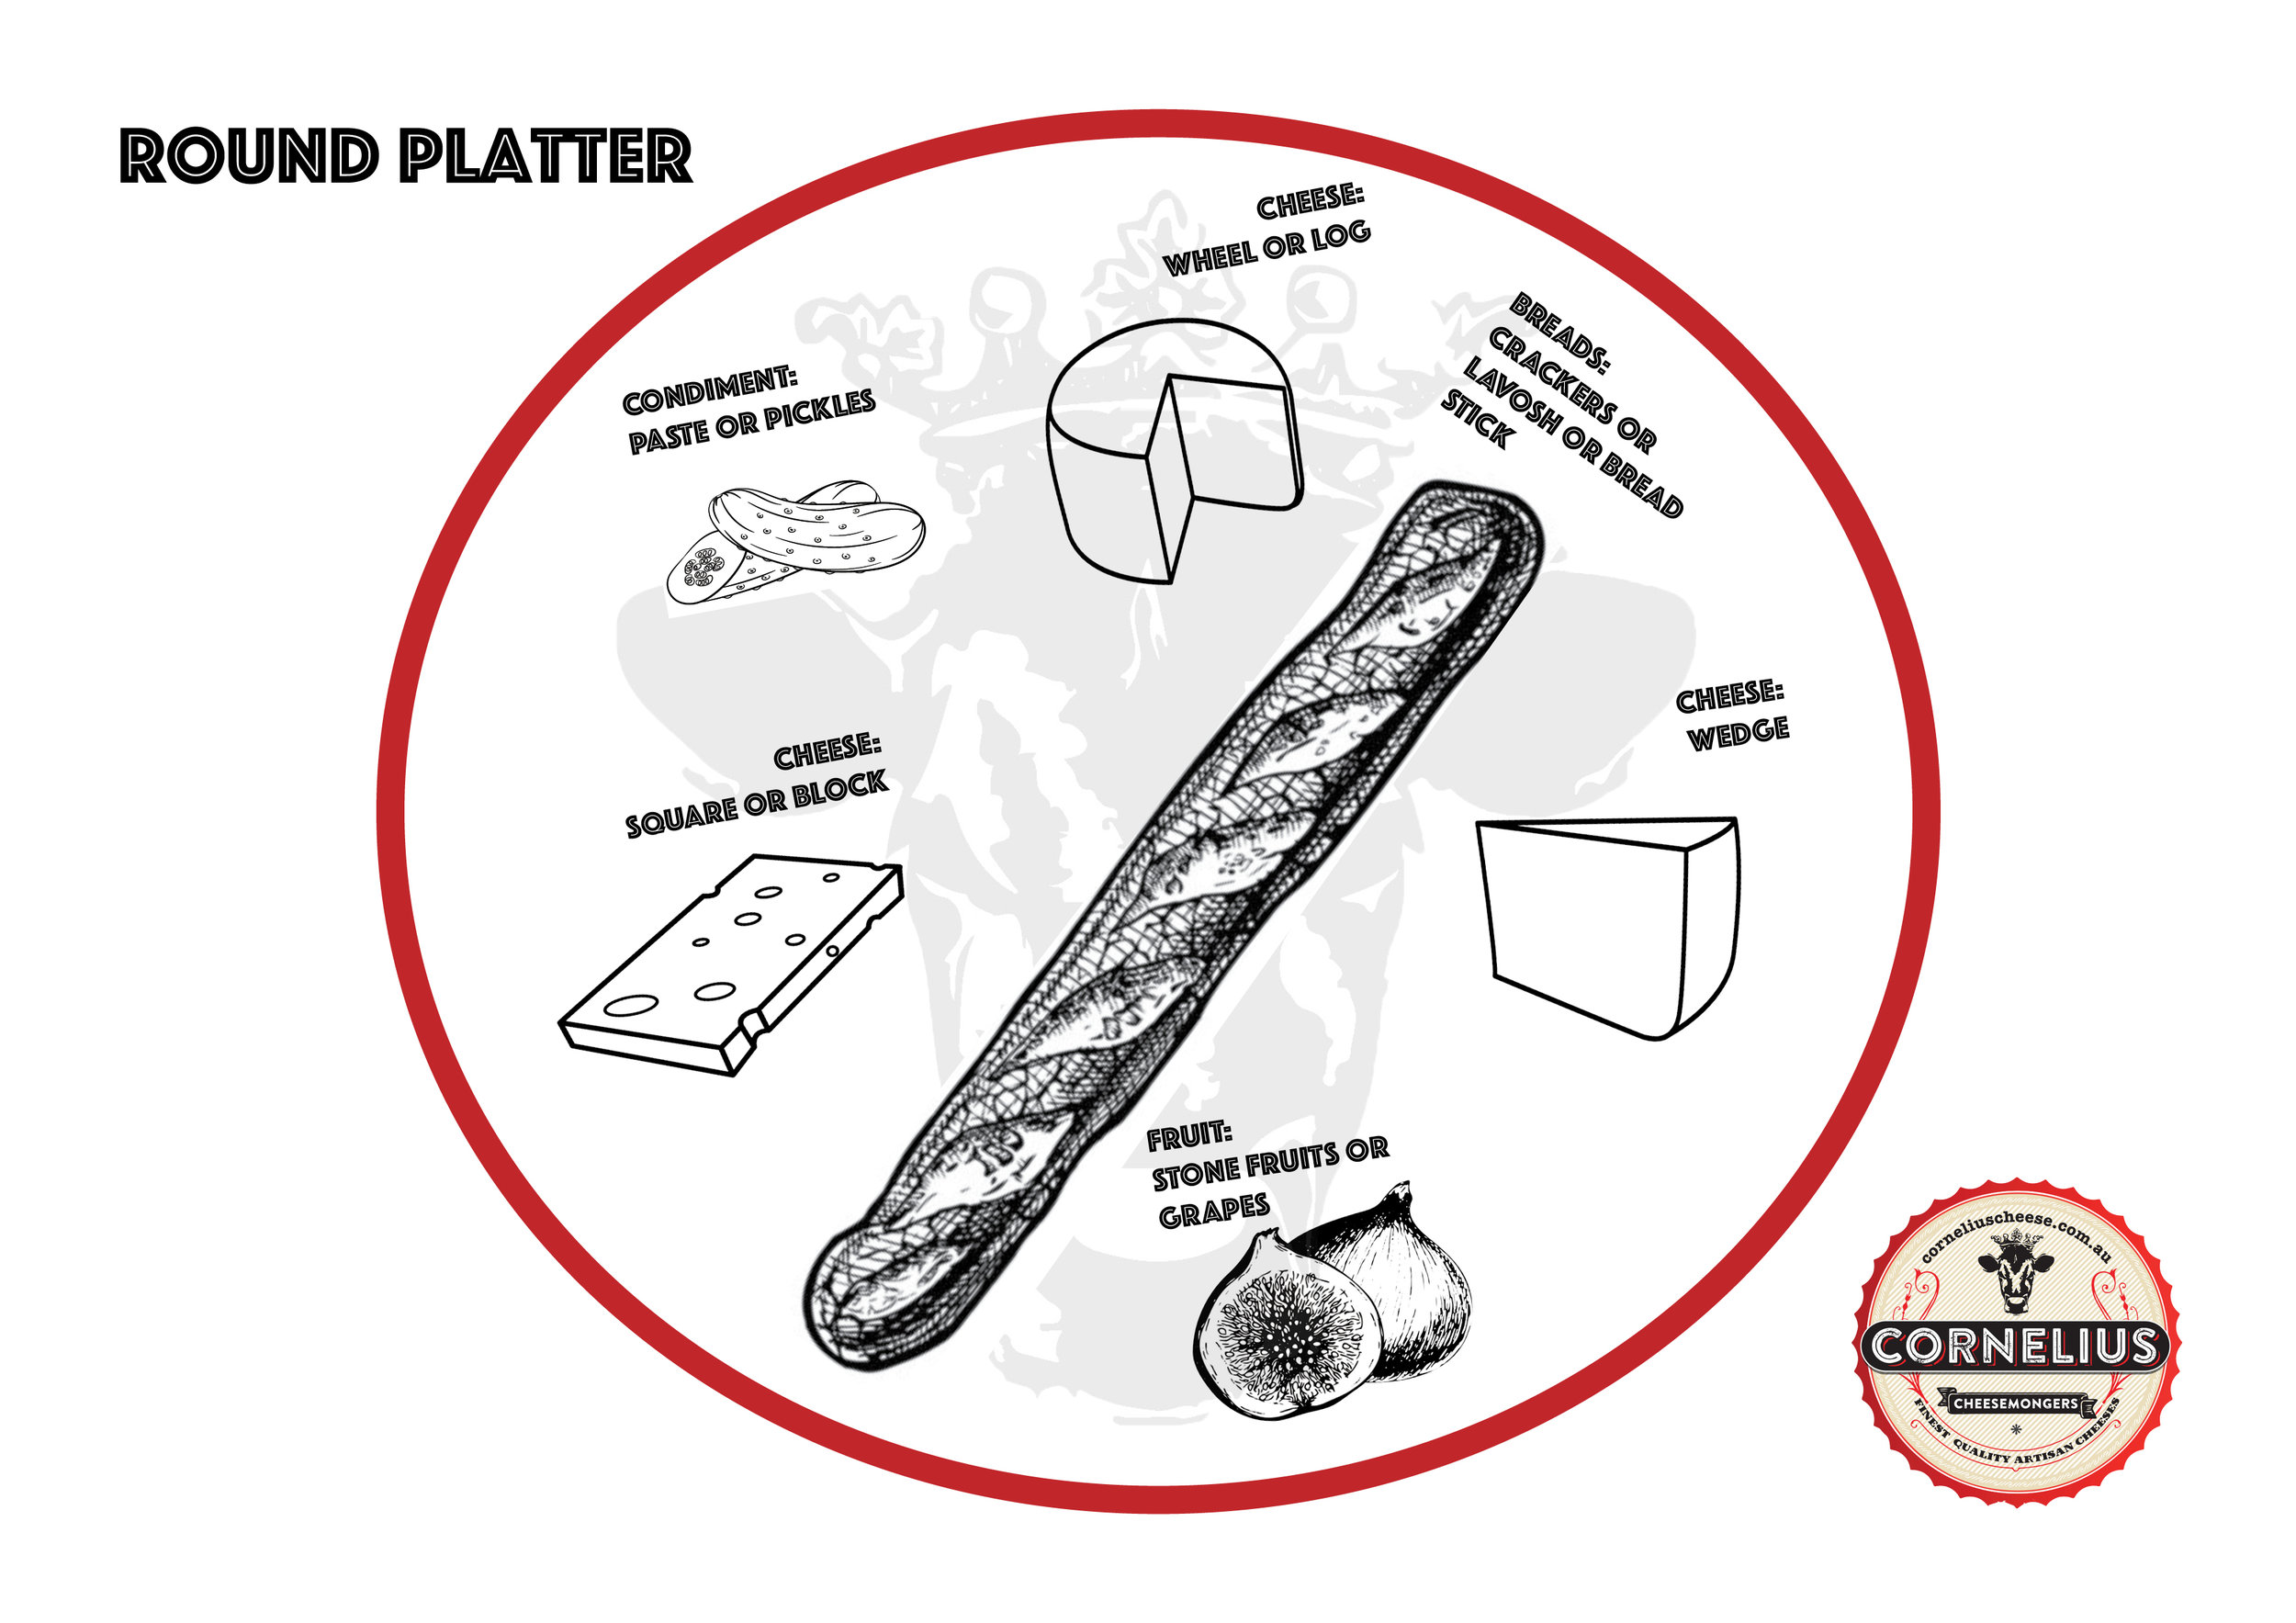 Round Platter BluePrint